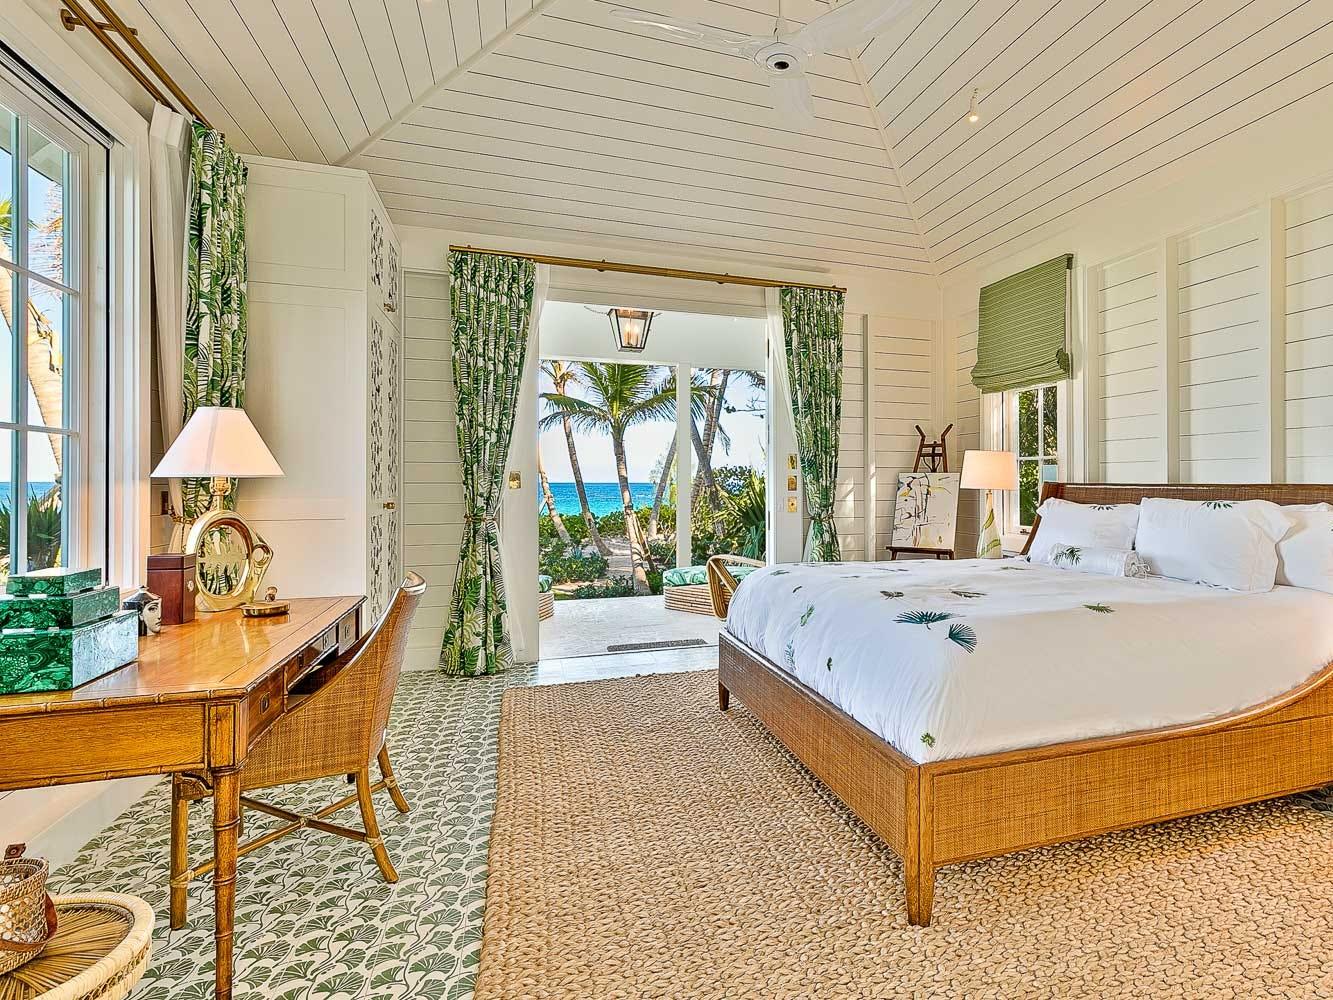 For more information: https://www.luxuryretreats.com/vacation-rentals/caribbean/bahamas-eleuthera-and-harbour-island/harbour-island/rosalita-bahamas-119431